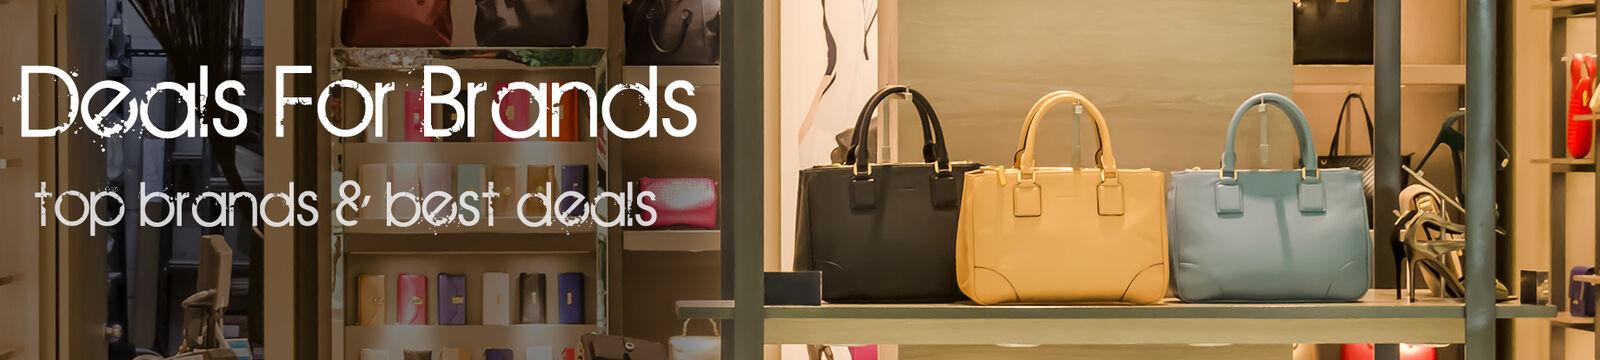 Deals and Brands